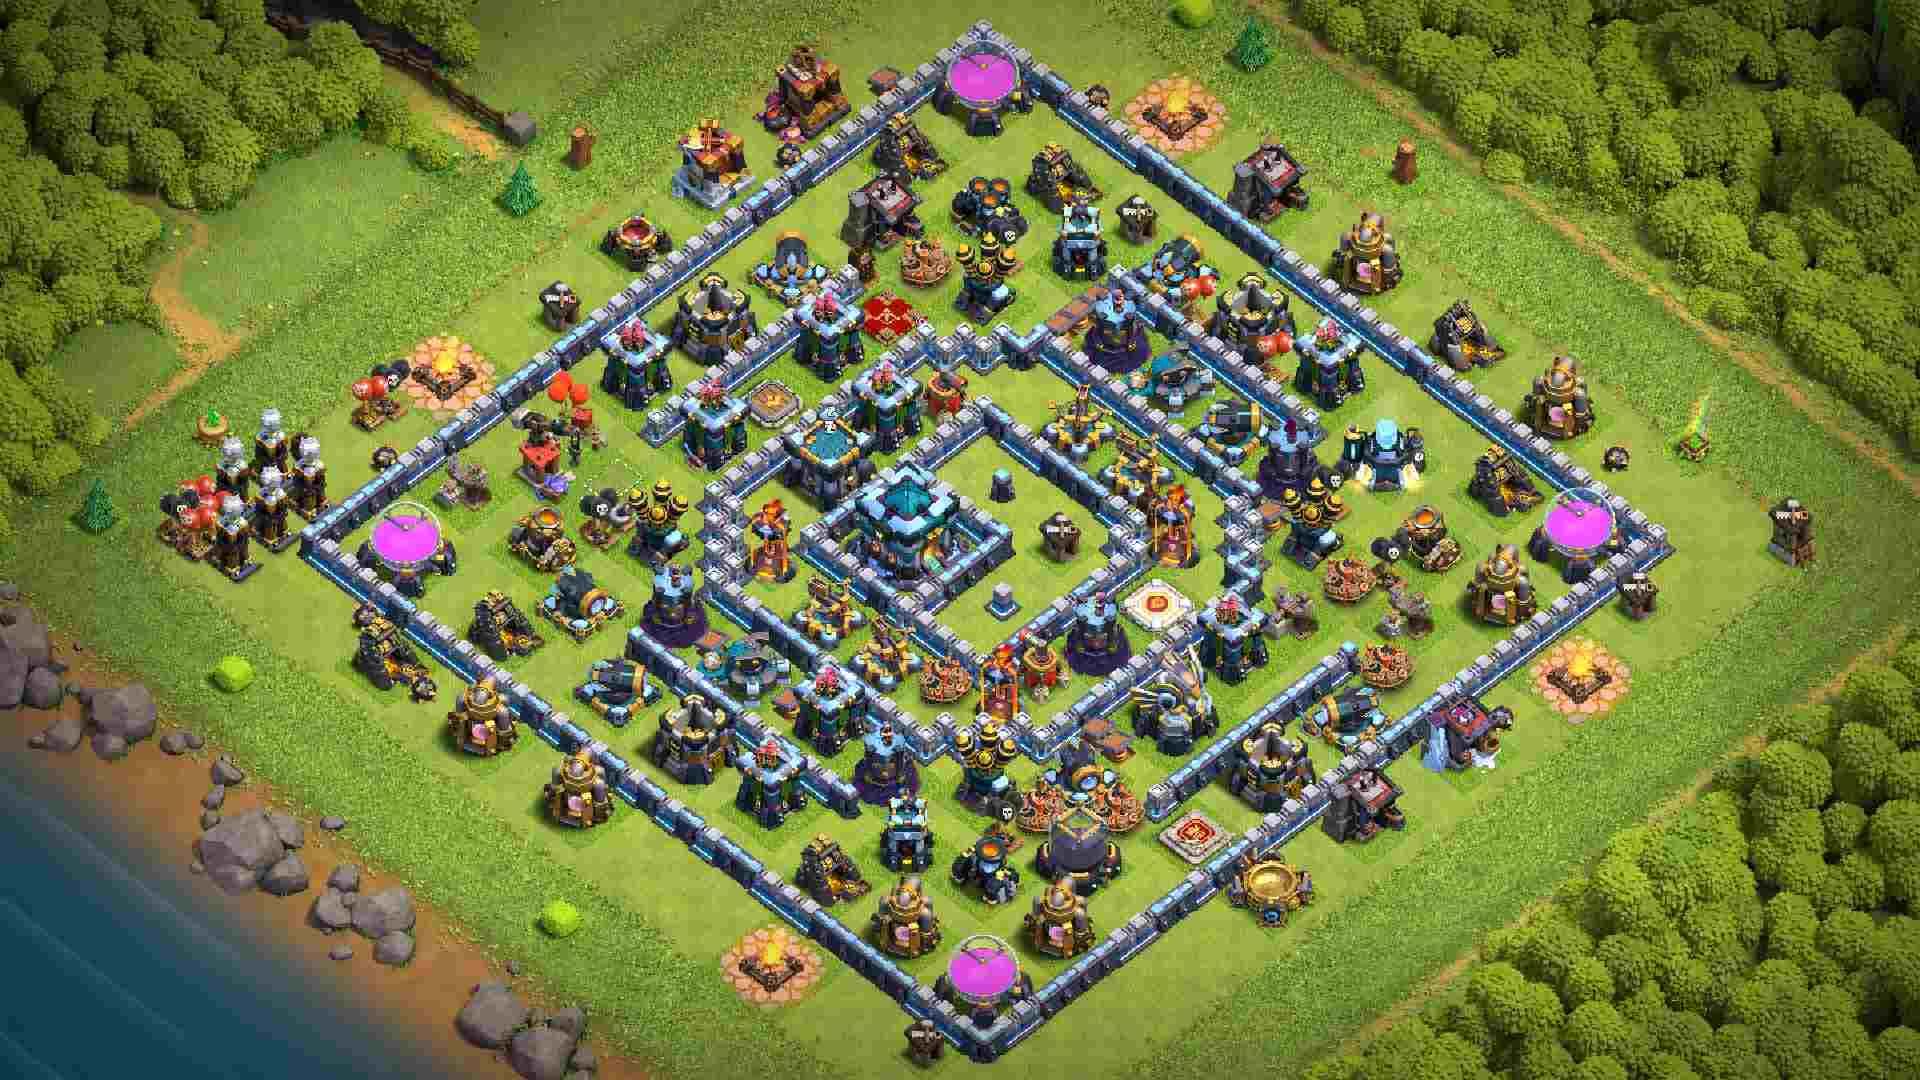 Base Th13 War/Bay cup Huyền Thoại | Clash of Clans